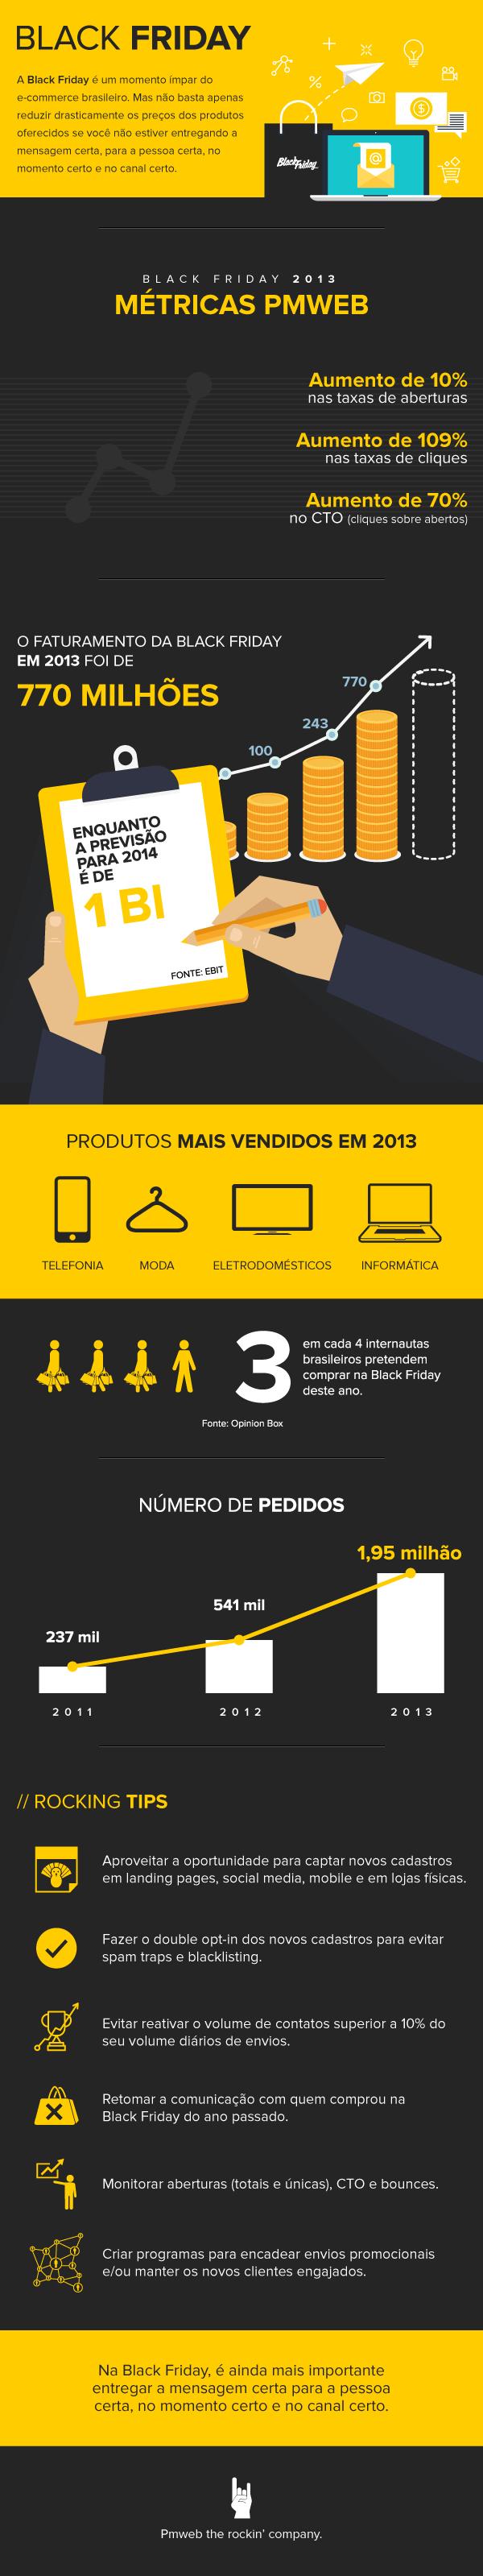 Infográfico Black Friday 2014